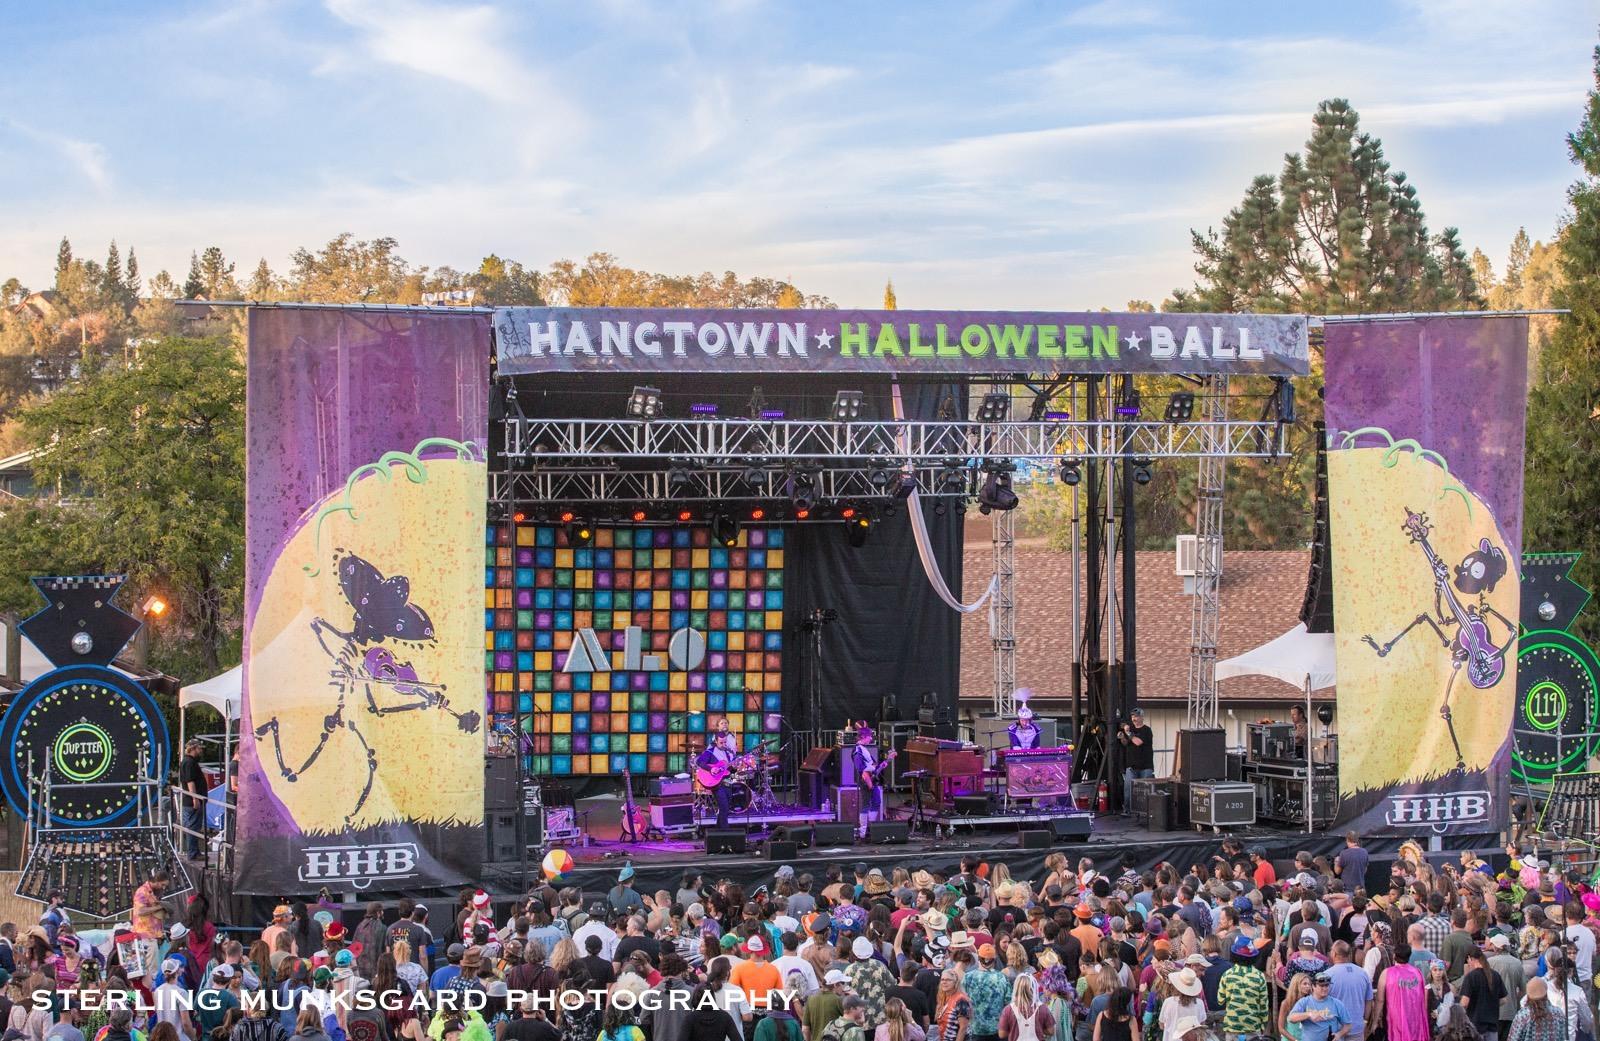 Hangtown Halloween Ball Announces Lineup Additions